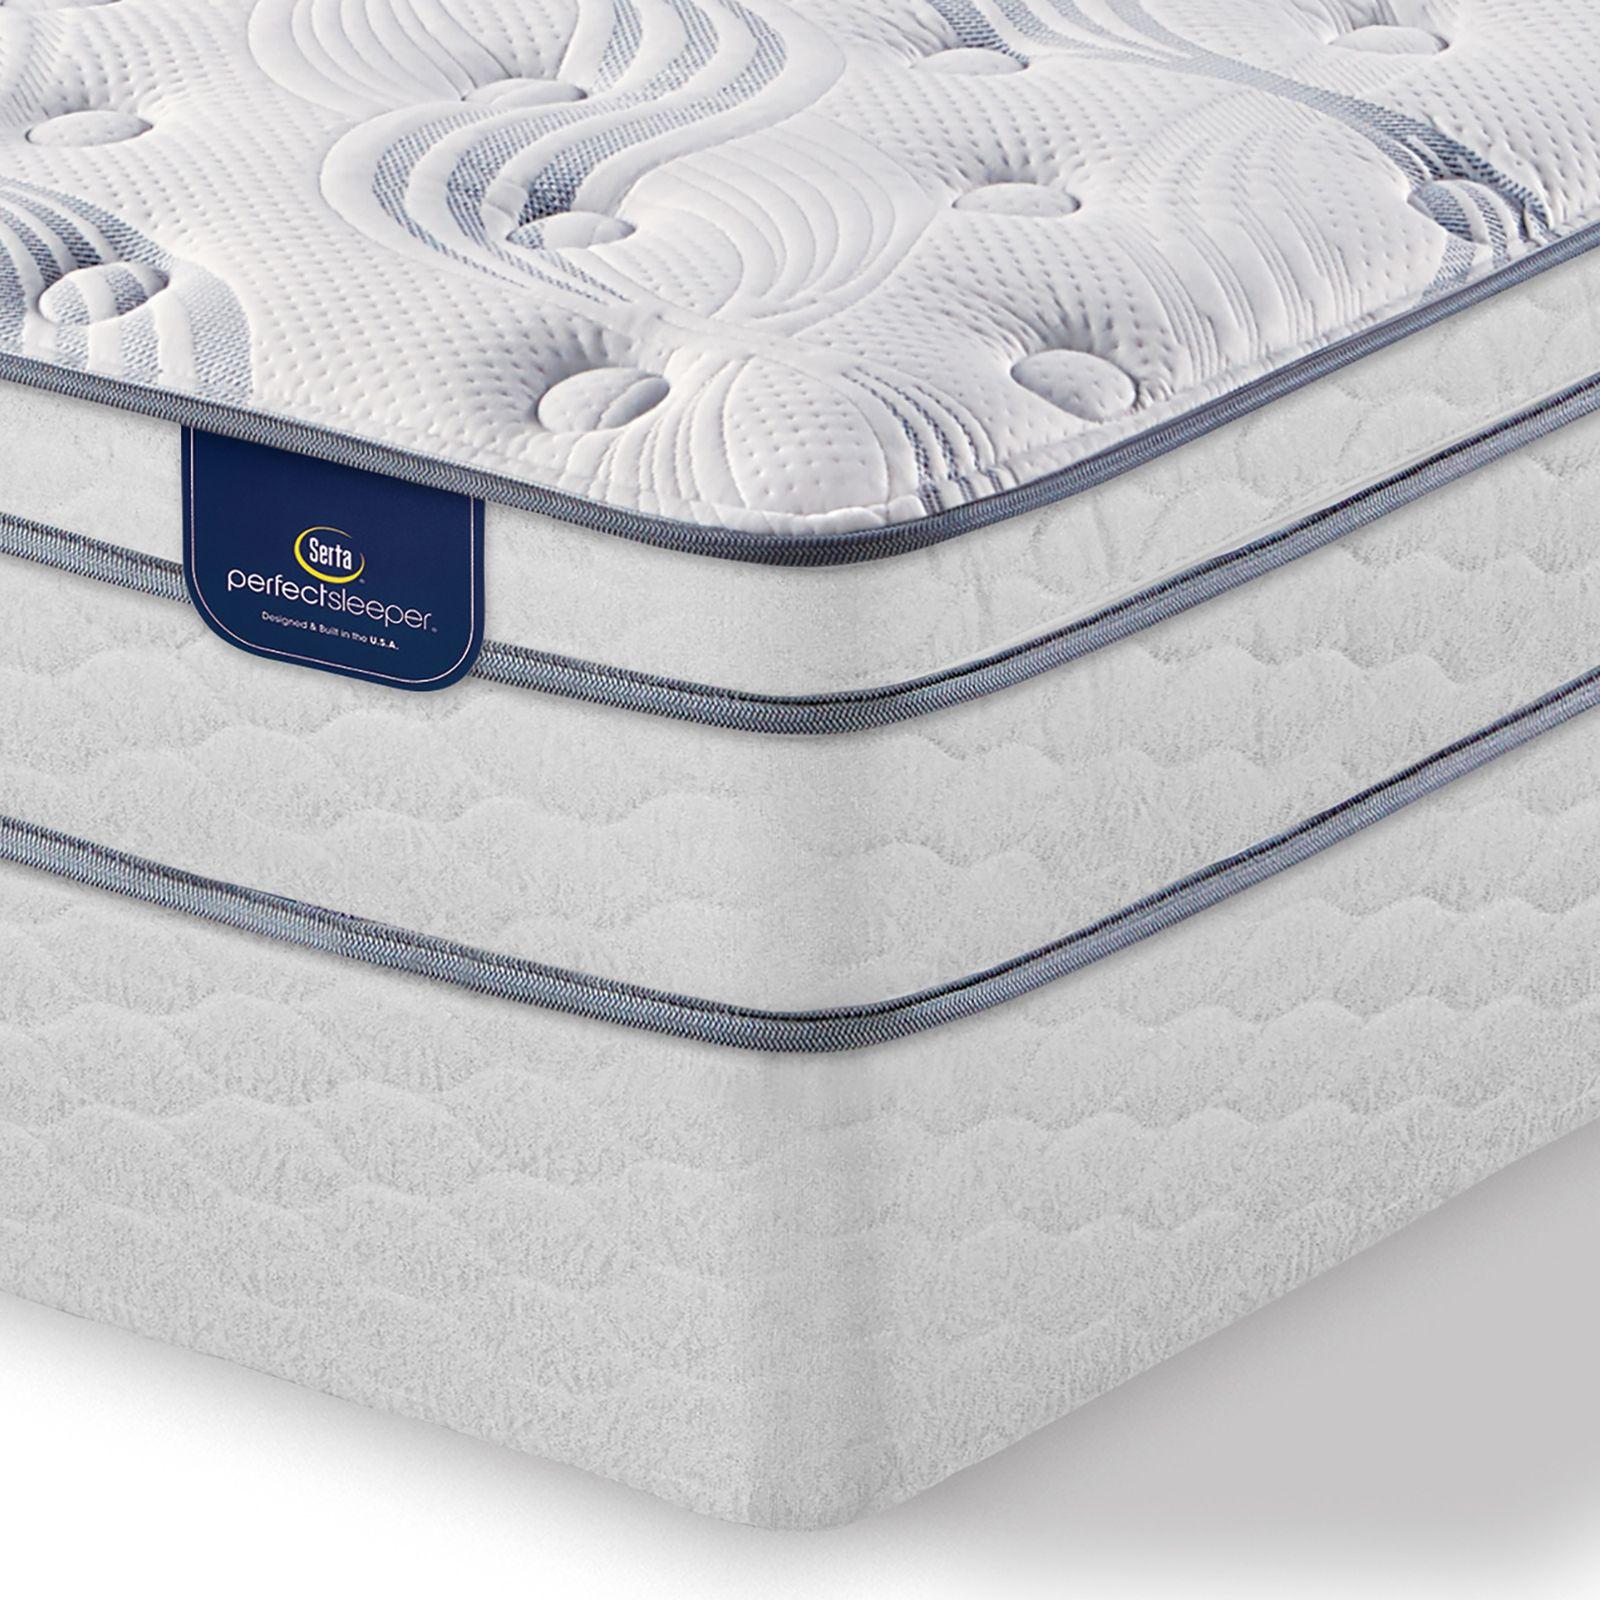 Serta Serta Perfect Sleeper Harlington Plush King Eurotop Mattress